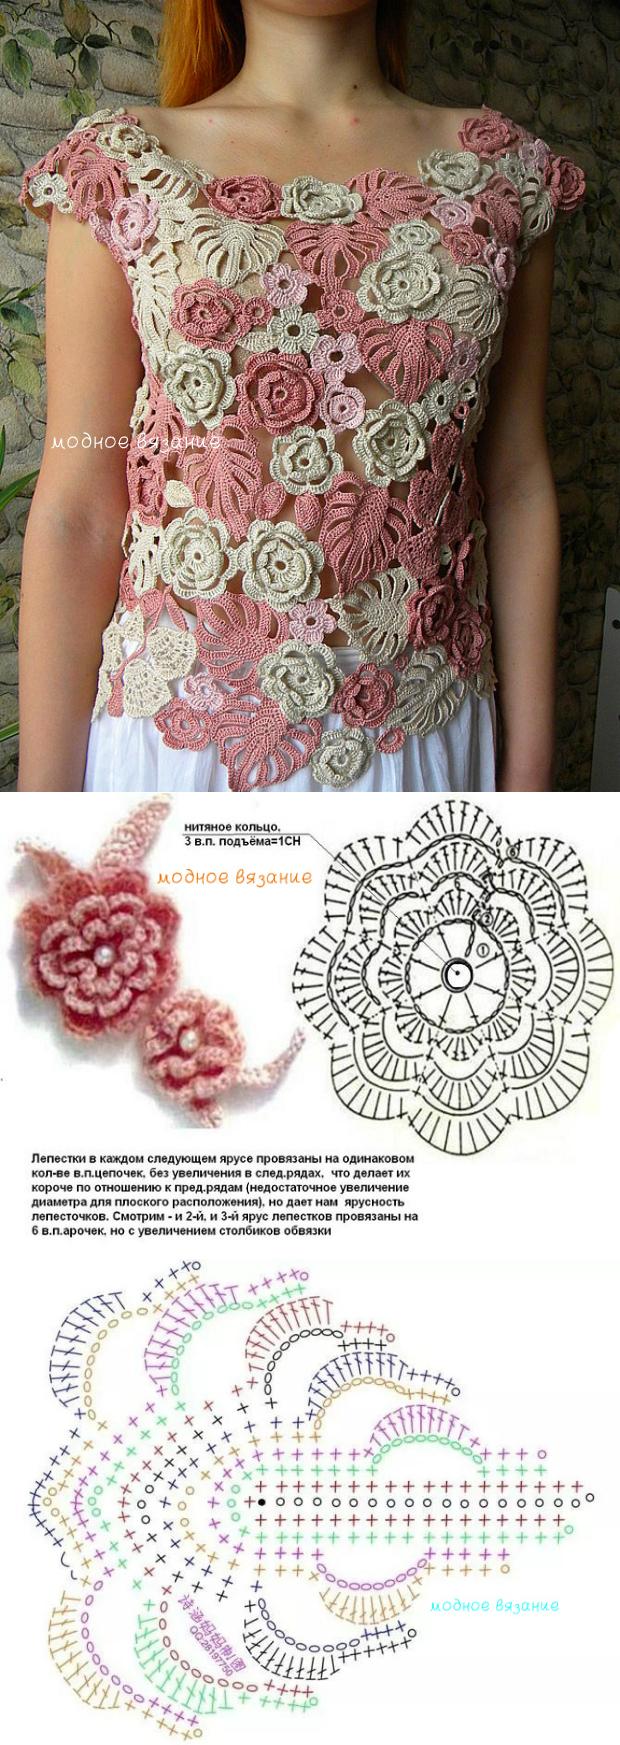 modnoevyazanie.ru.com | Ganchillo | Pinterest | Blusas, Tejido y ...